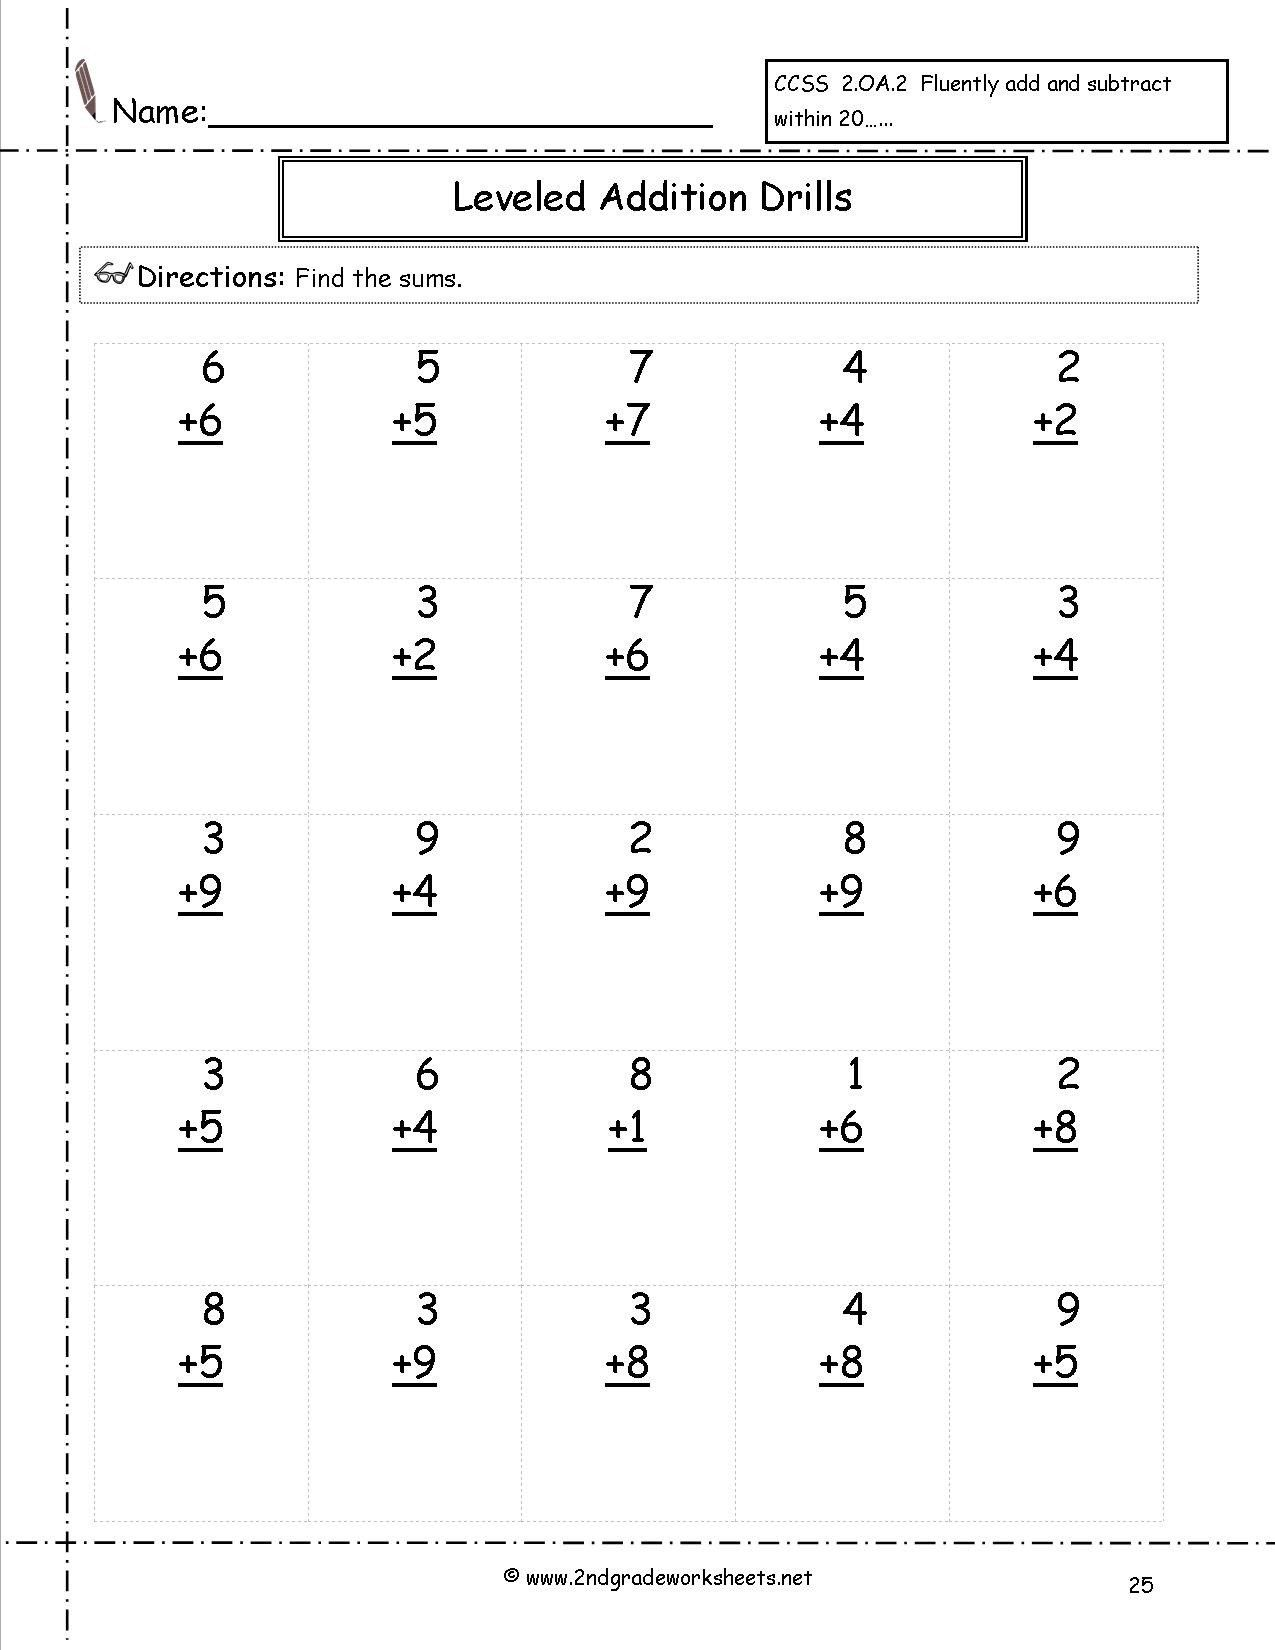 Mental Math Worksheets Grade 6 Free Math Worksheets And Printouts In 2020 Basic Math Worksheets Free Printable Math Worksheets 2nd Grade Math Worksheets [ 1650 x 1275 Pixel ]